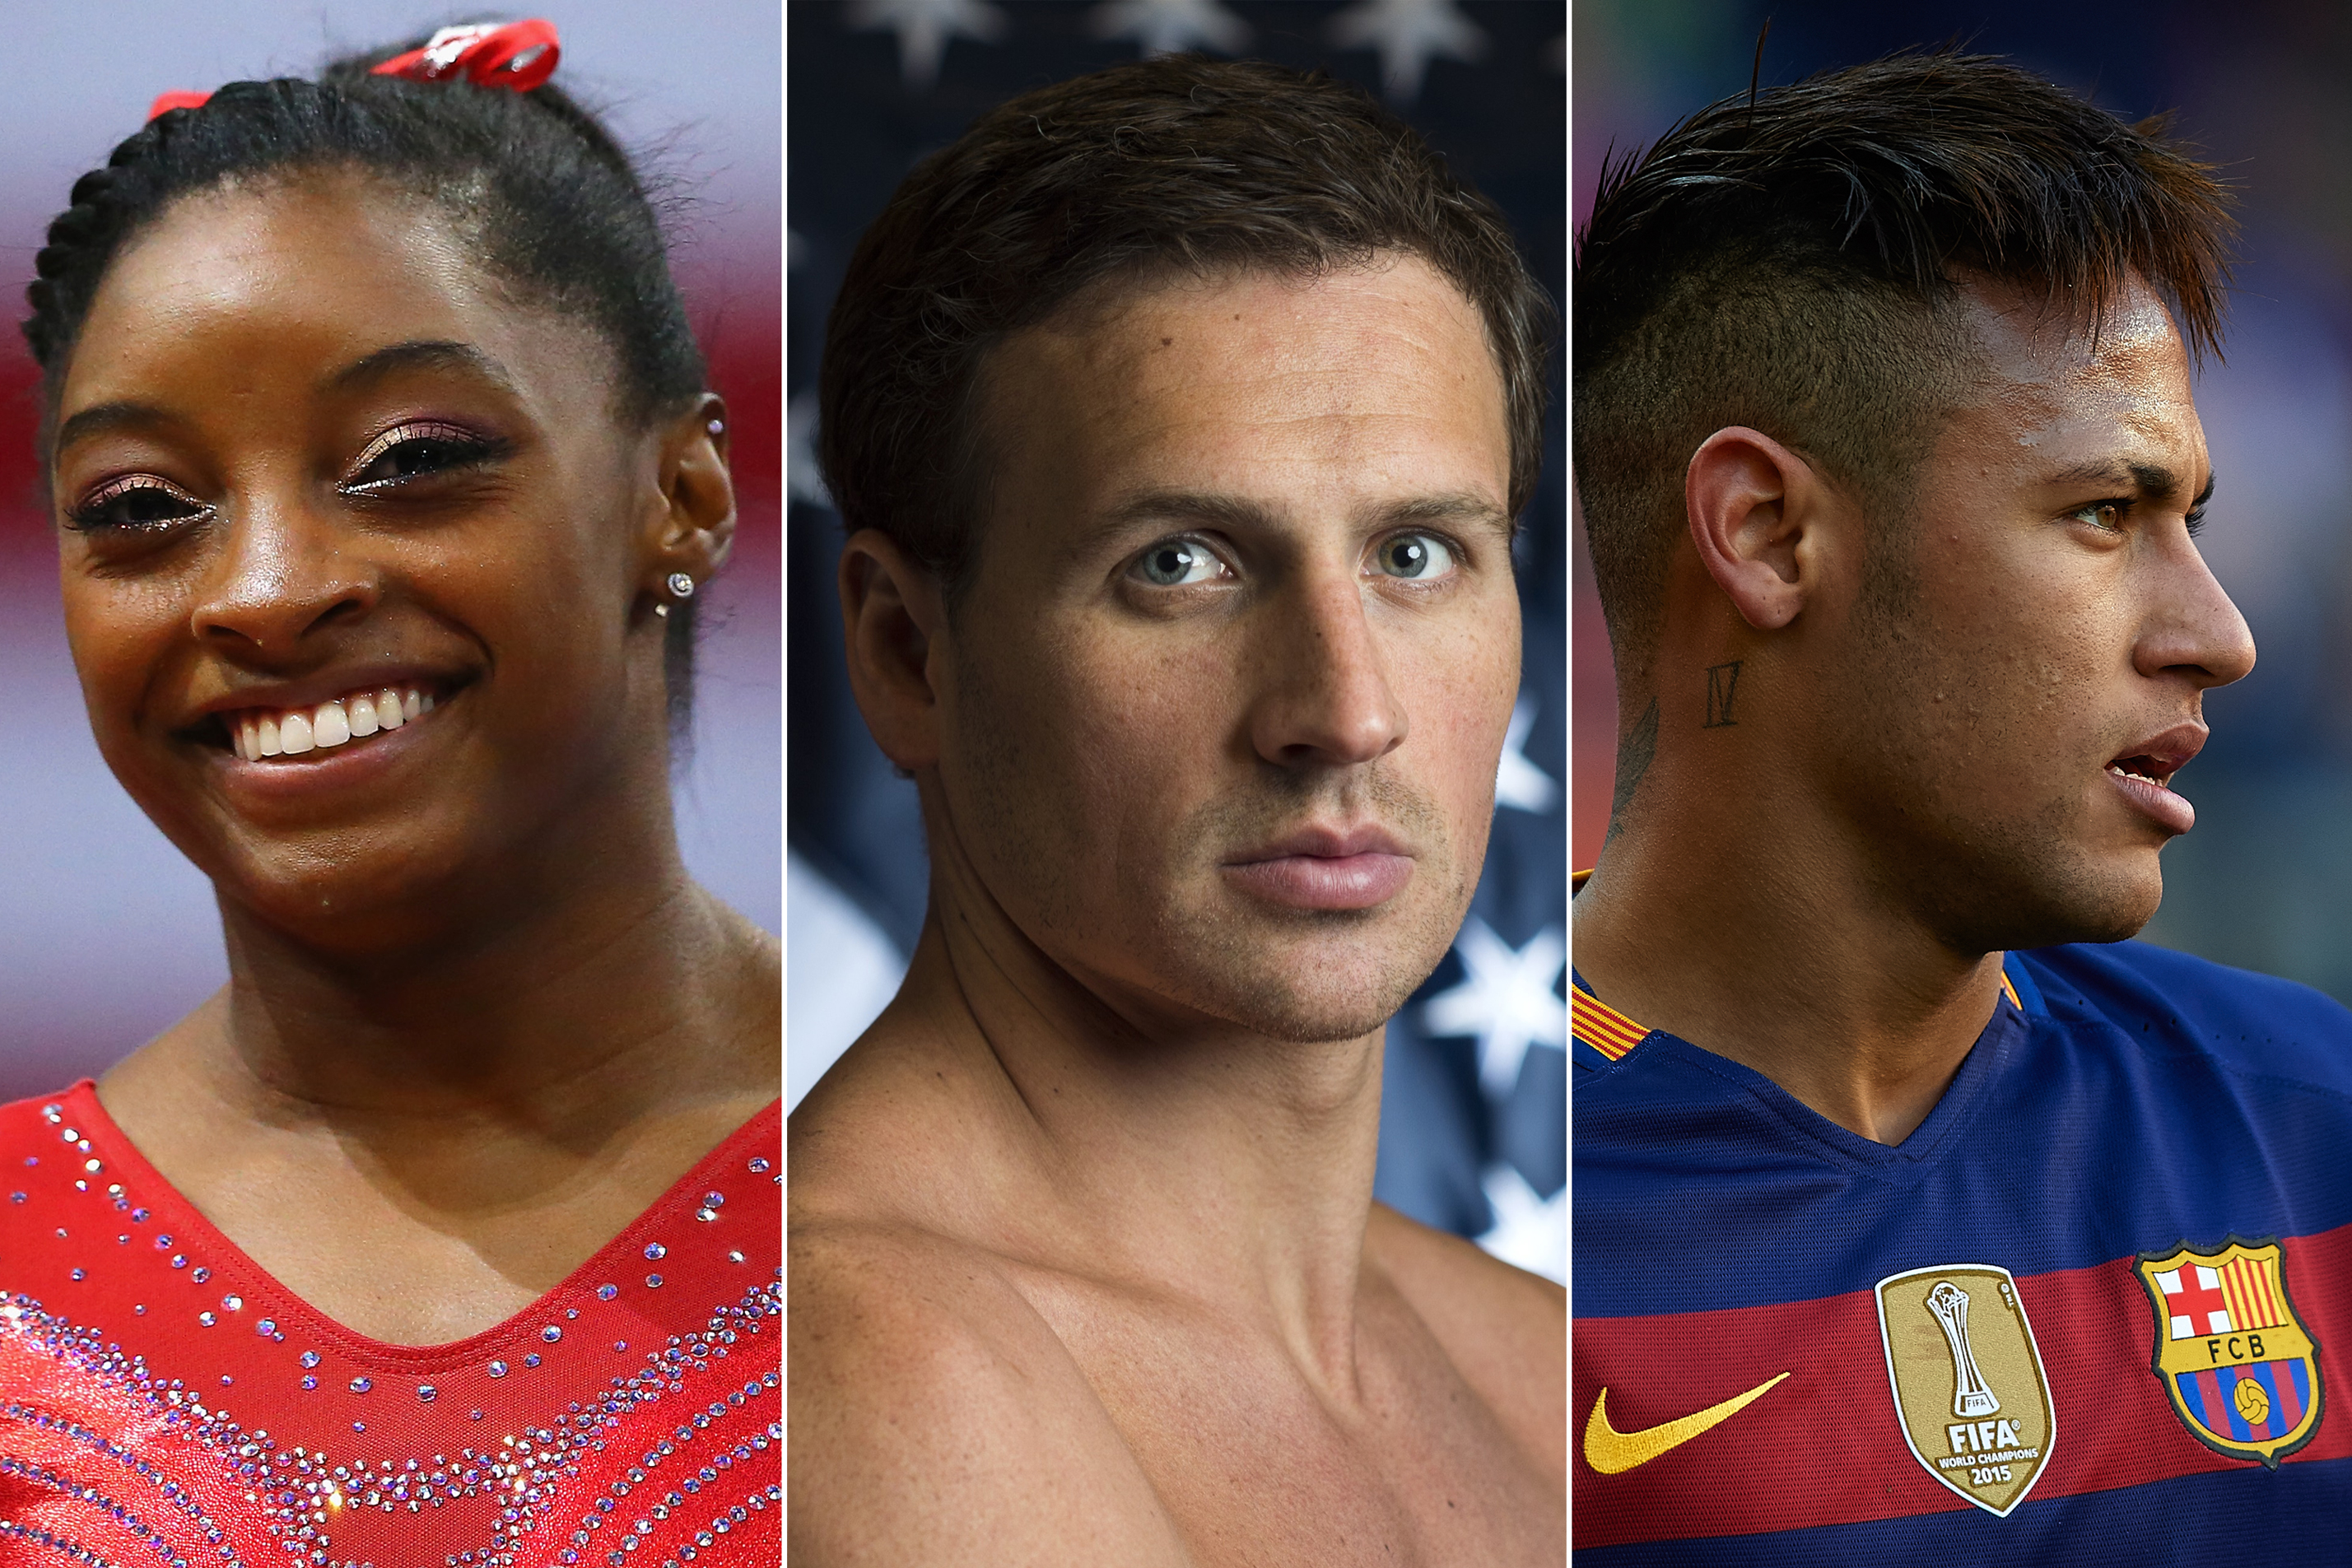 Simone Biles, Ryan Lochte and Neymar JR